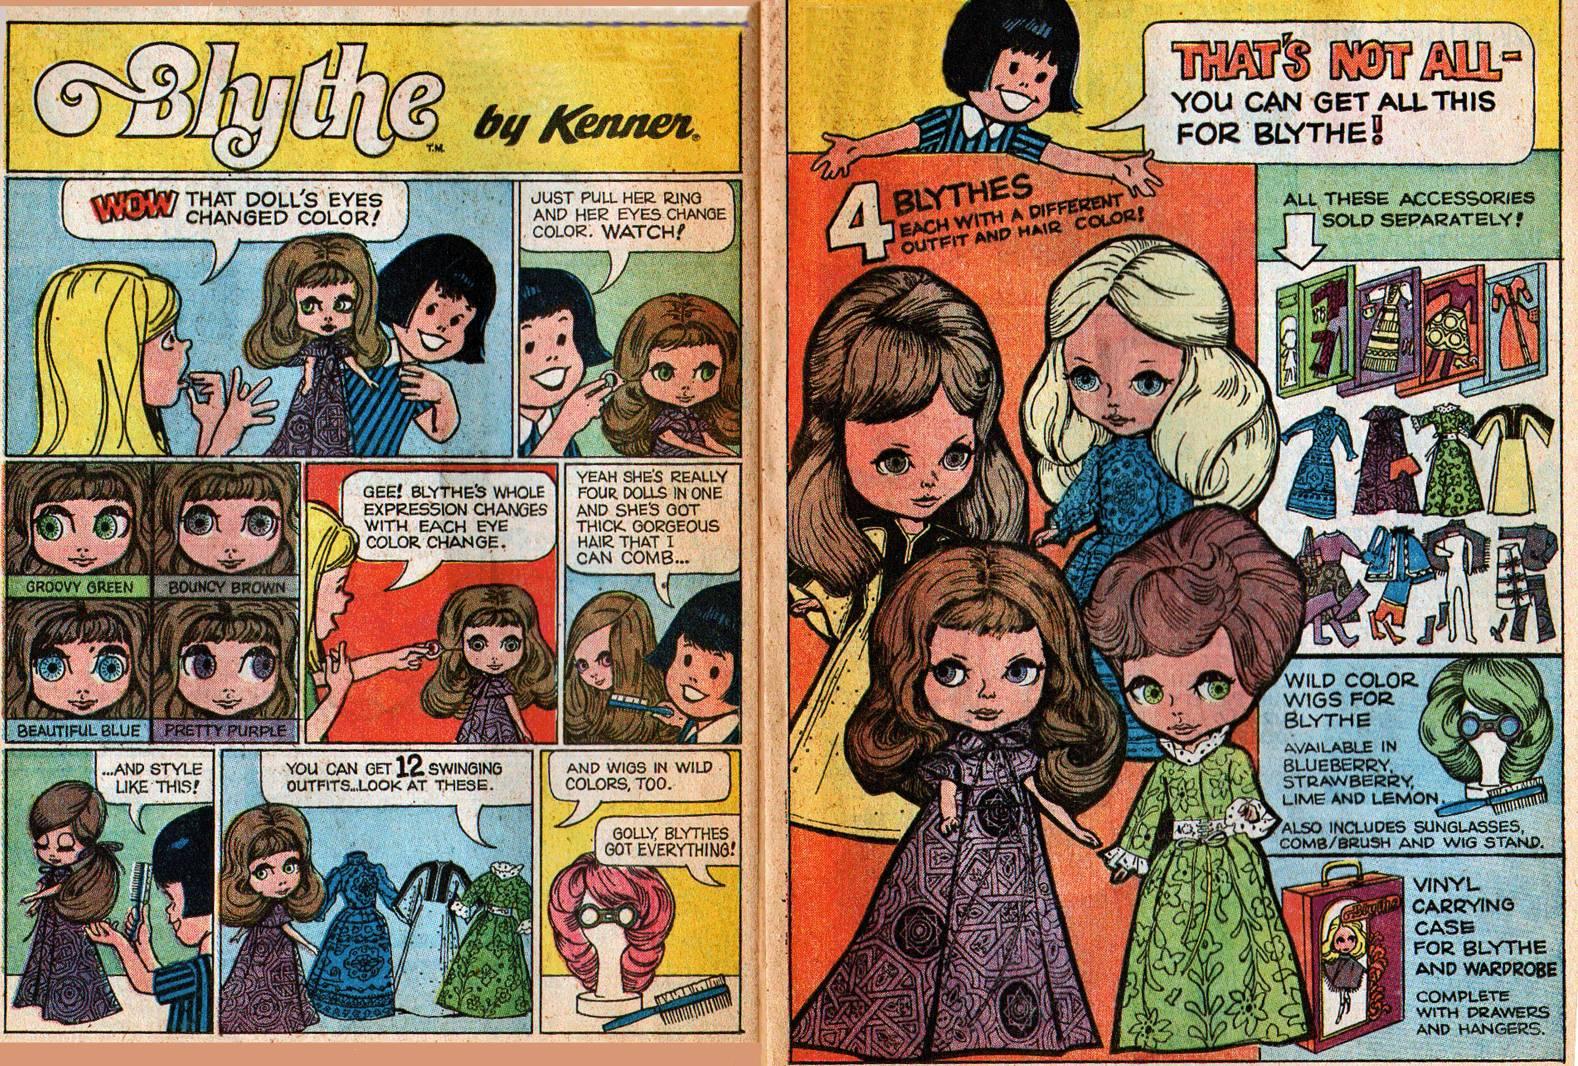 zazie_blytheopedia_kenner_blythe_dolls_advertise